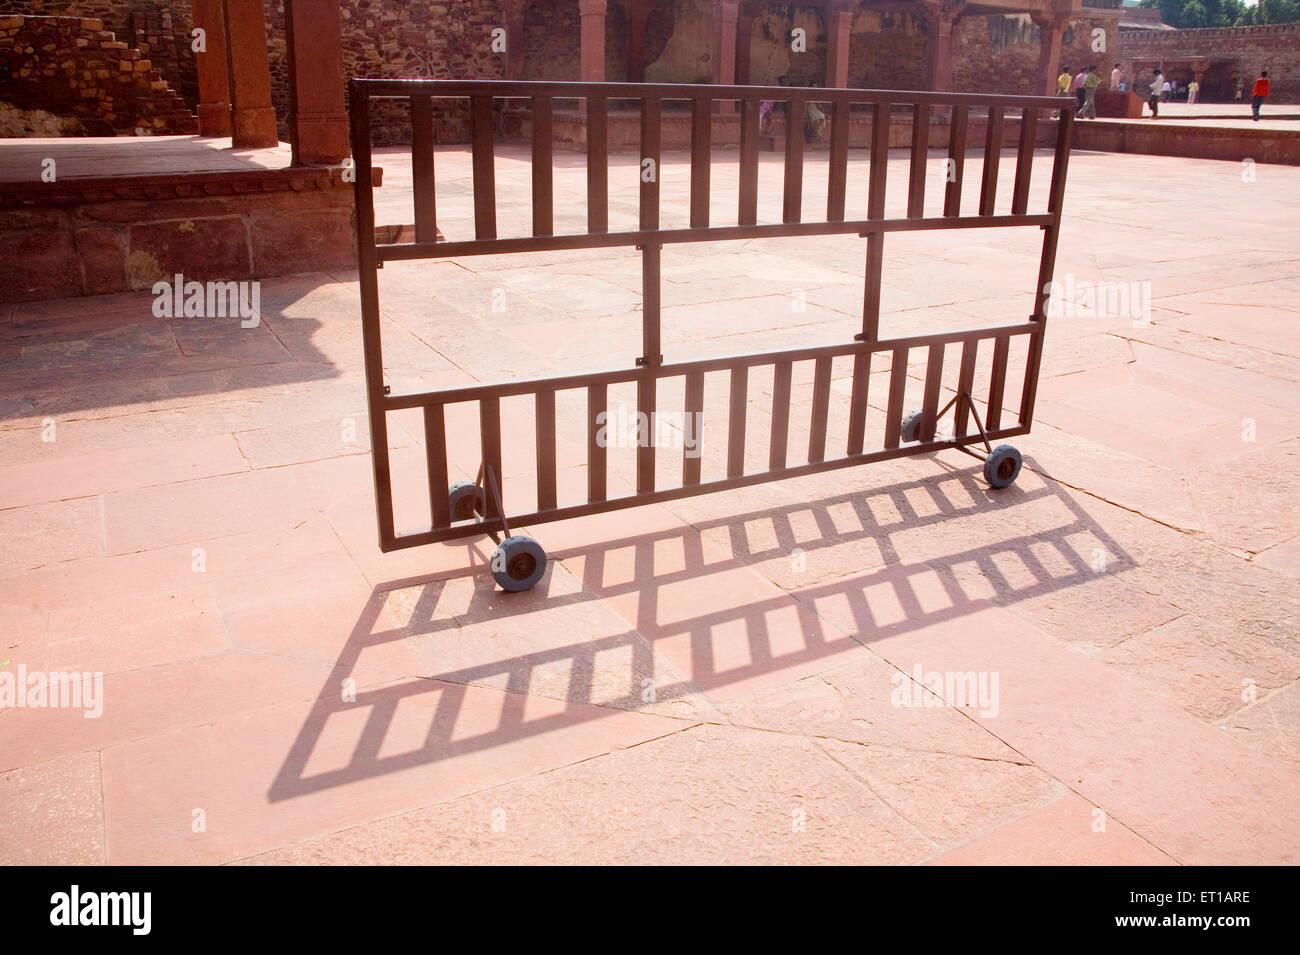 Iron wheeled structure to control the people ; Fatehpur Sikiri ; Uttar Pradesh ; India - Stock Image